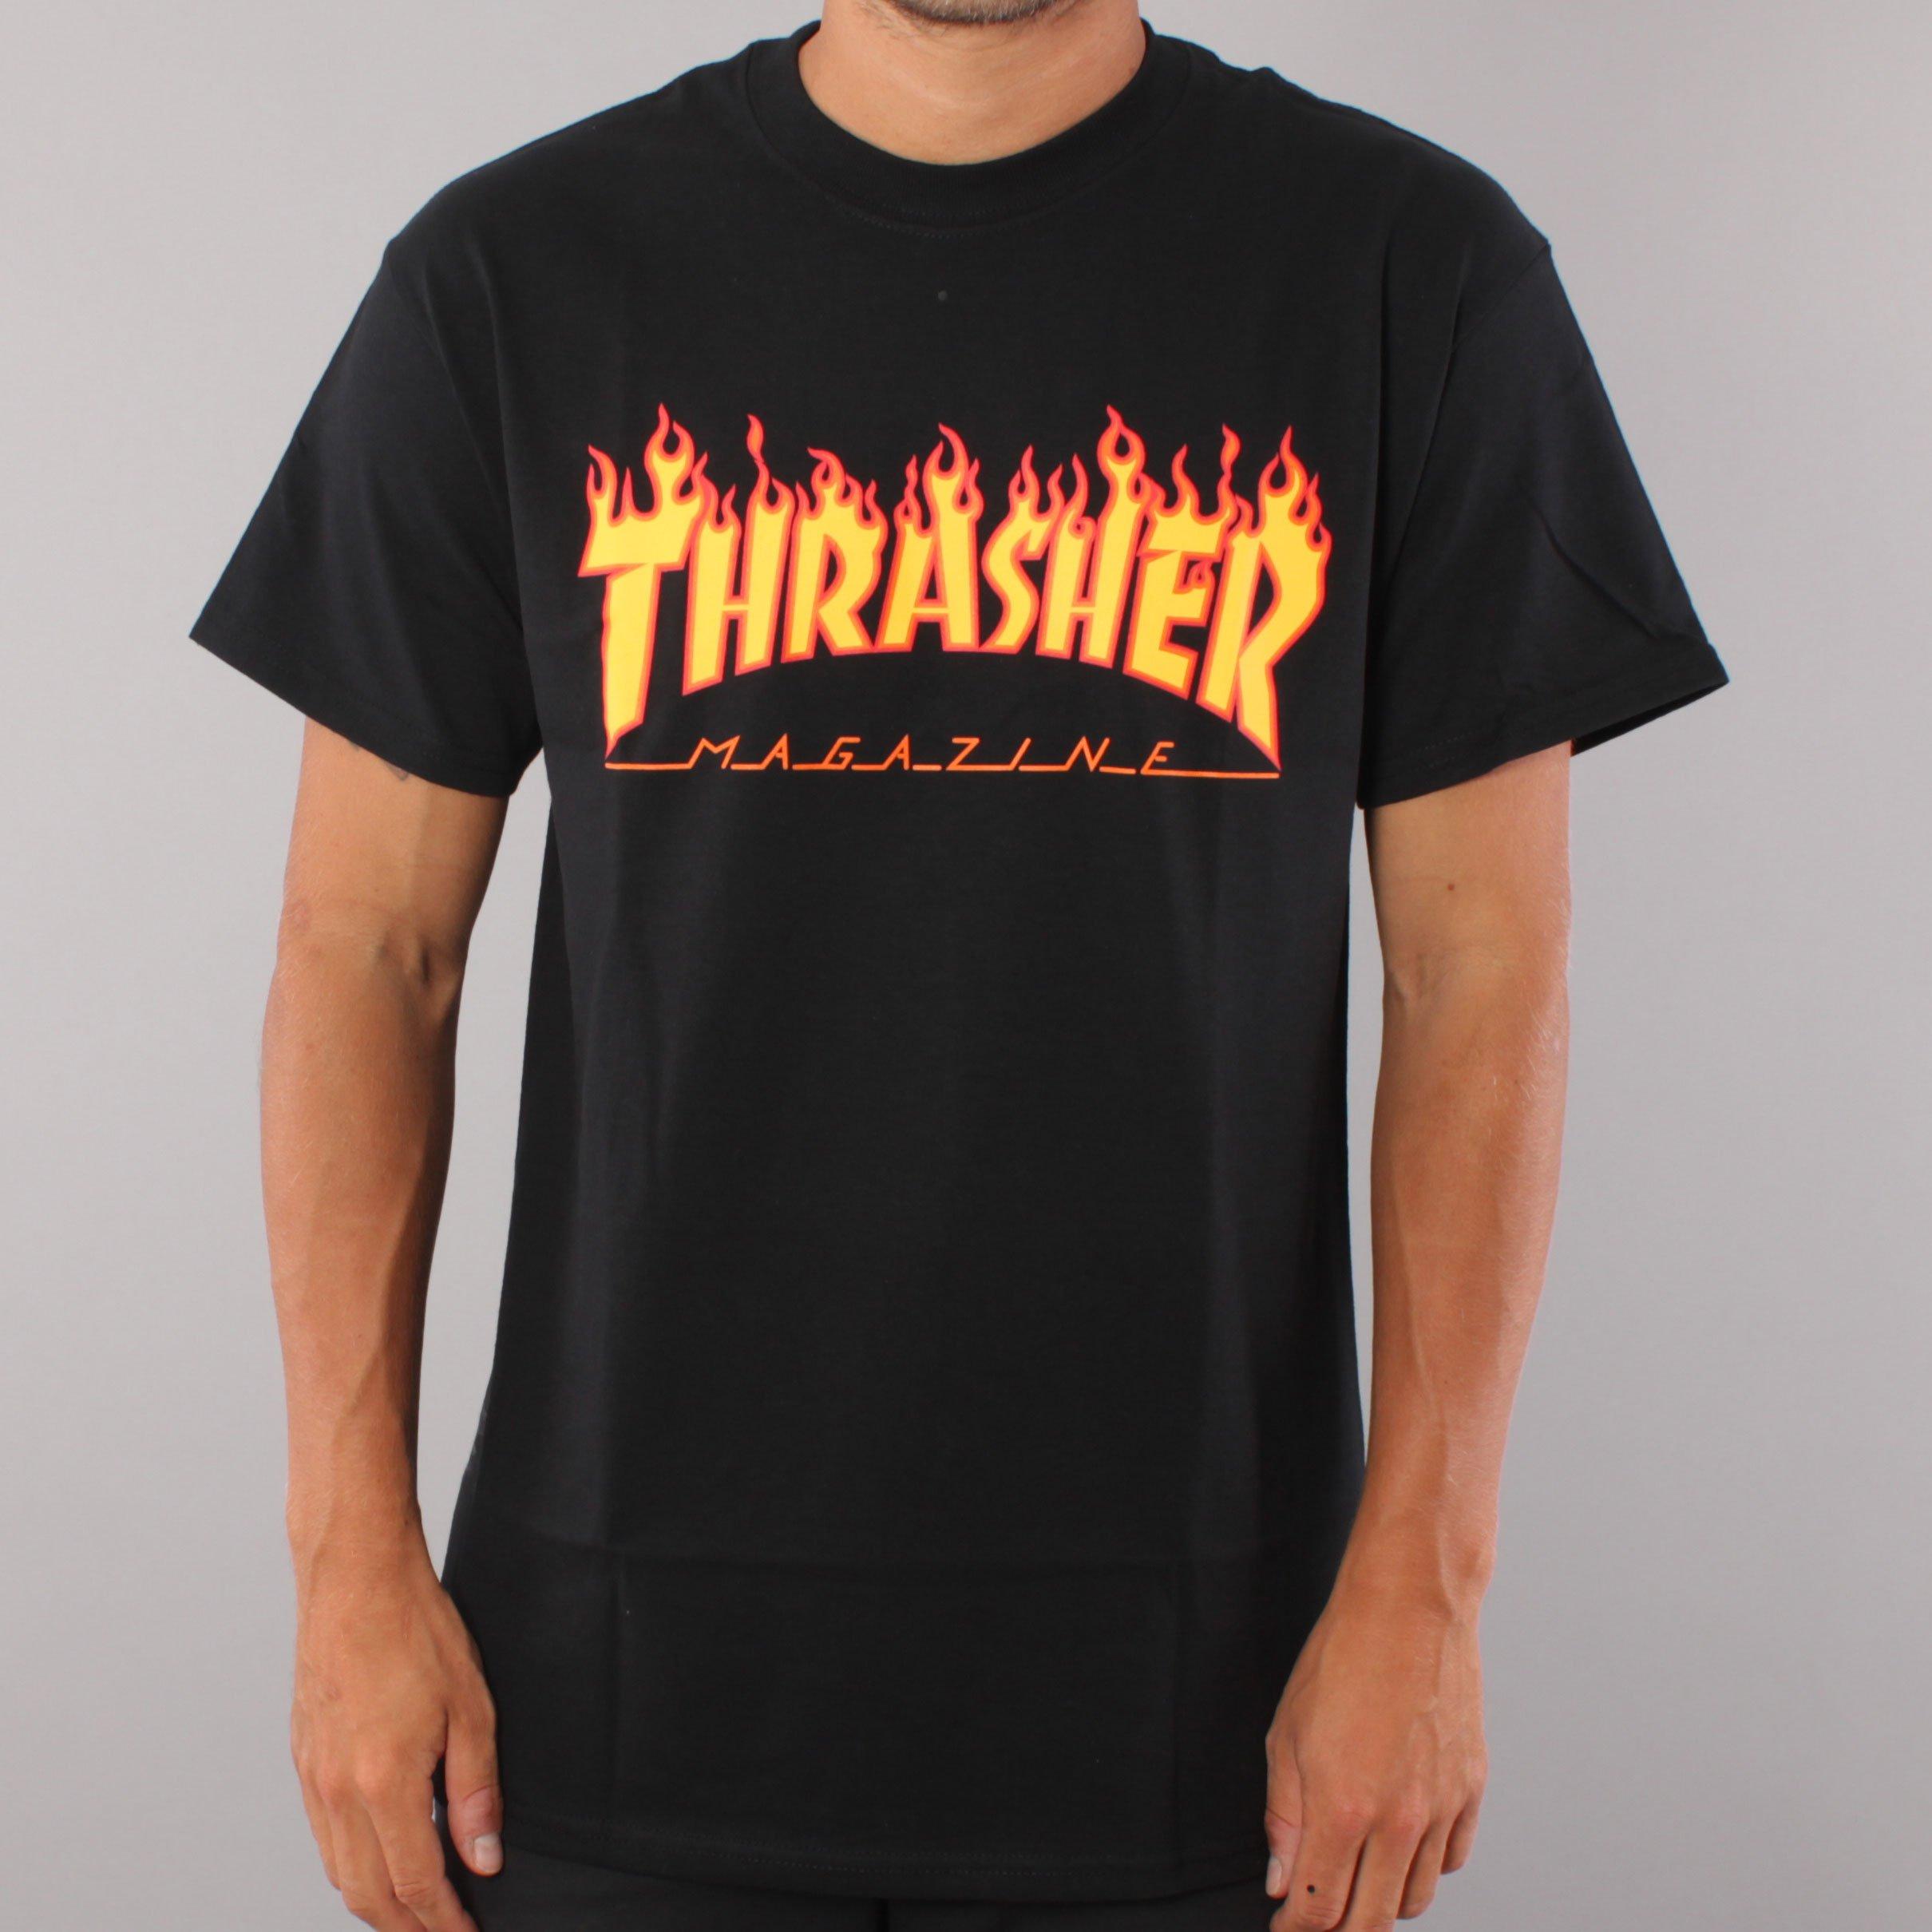 Thrasher Flame Logo T-shirt - Black